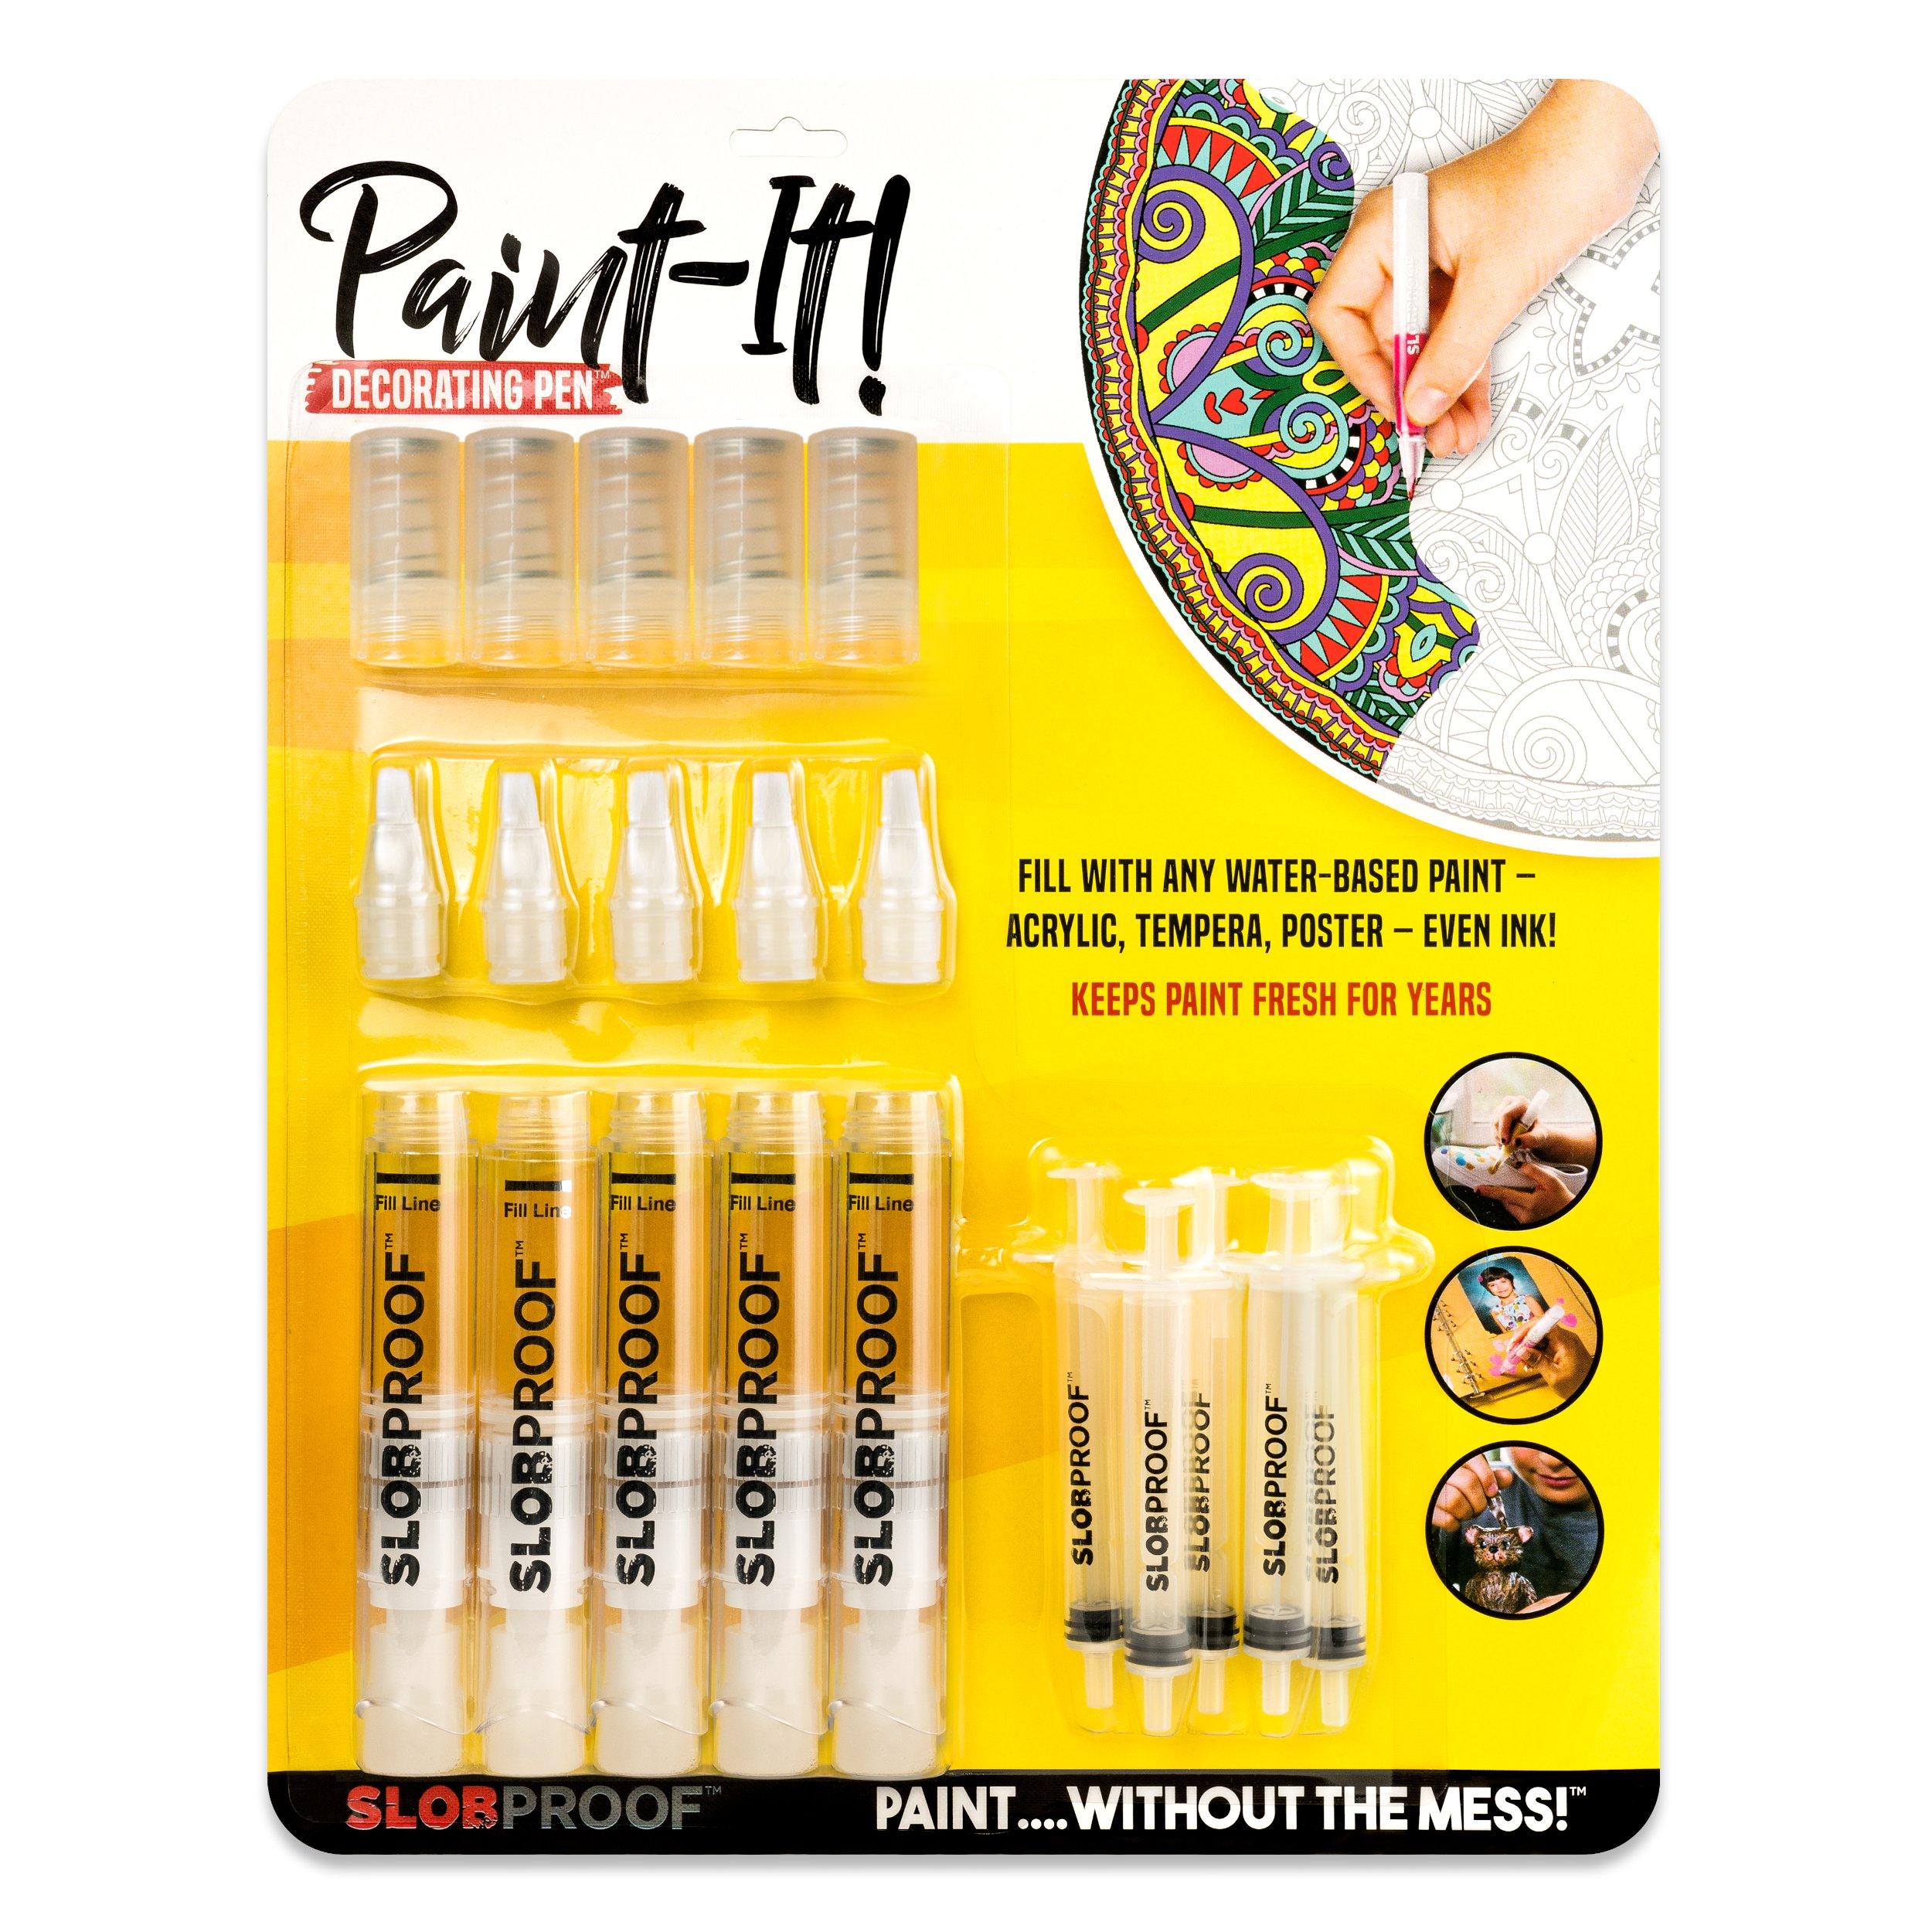 Slobproof Acrylic Paint Pens | Paint Brush Pens FiIll With Any Rock Paint, Canvas Paint, Glass Paint, Ceramic Paint or Glitter Paint | Medium-Point Paint Markers for Rock Painting and Fabric Painting